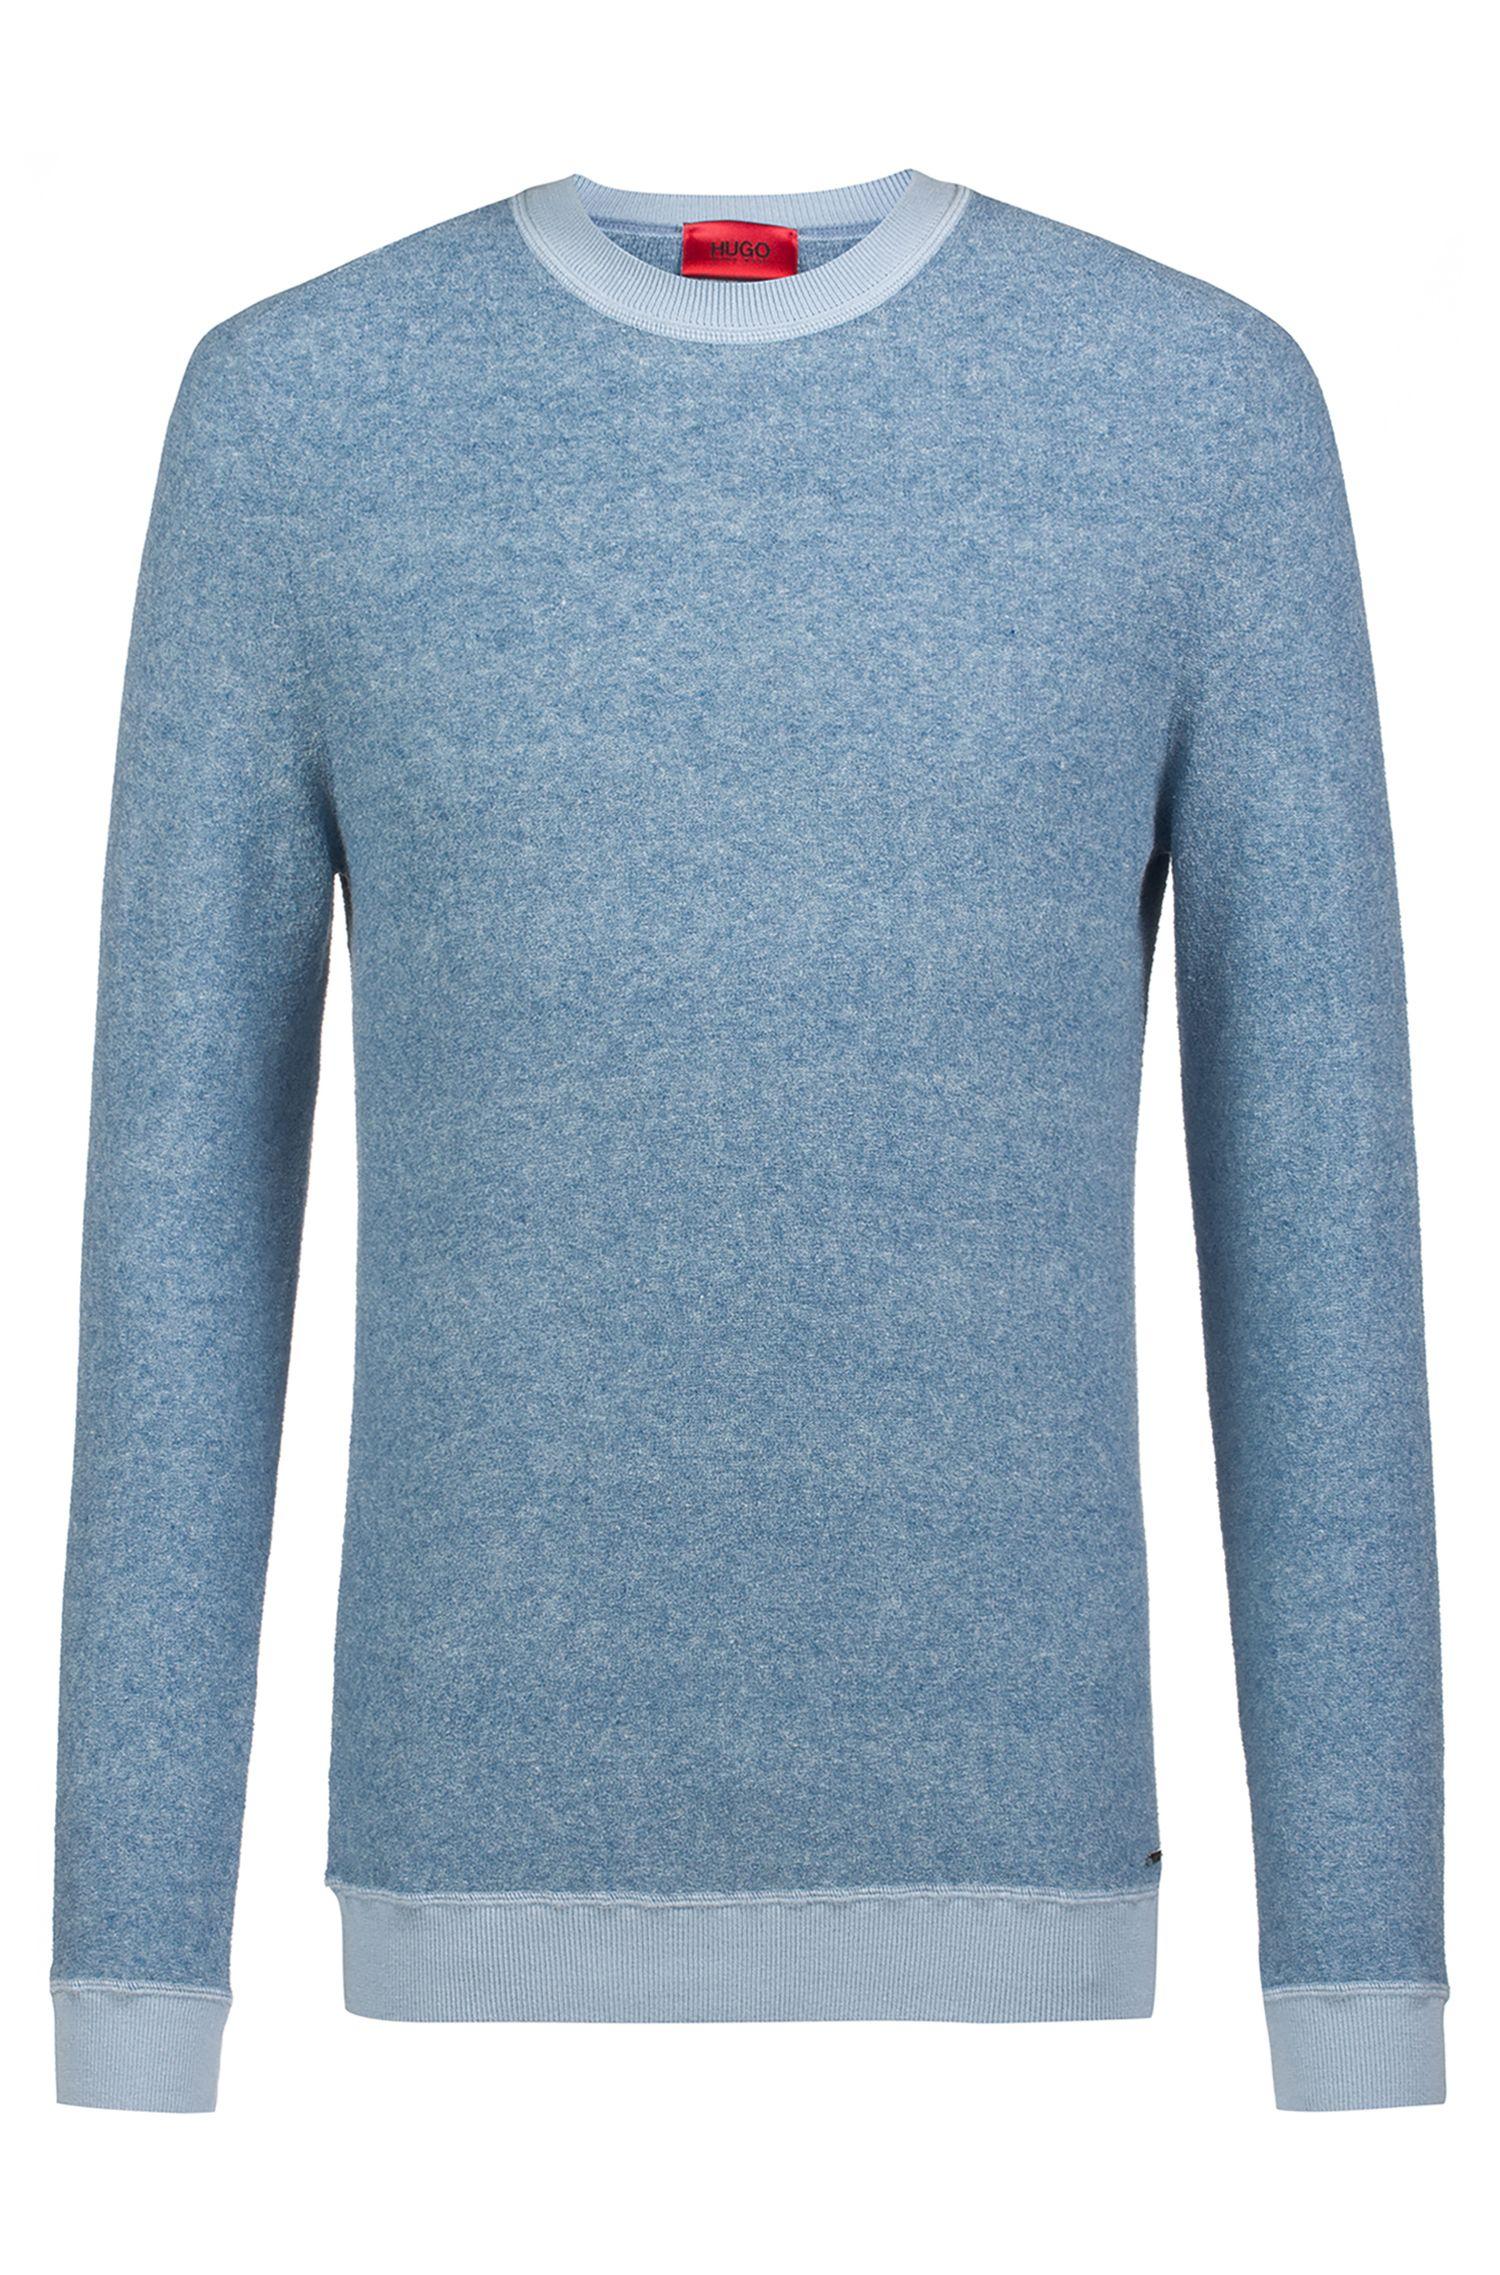 Relaxed-Fit Pullover aus gestricktem Baumwoll-Mix mit Bouclé-Struktur, Hellblau